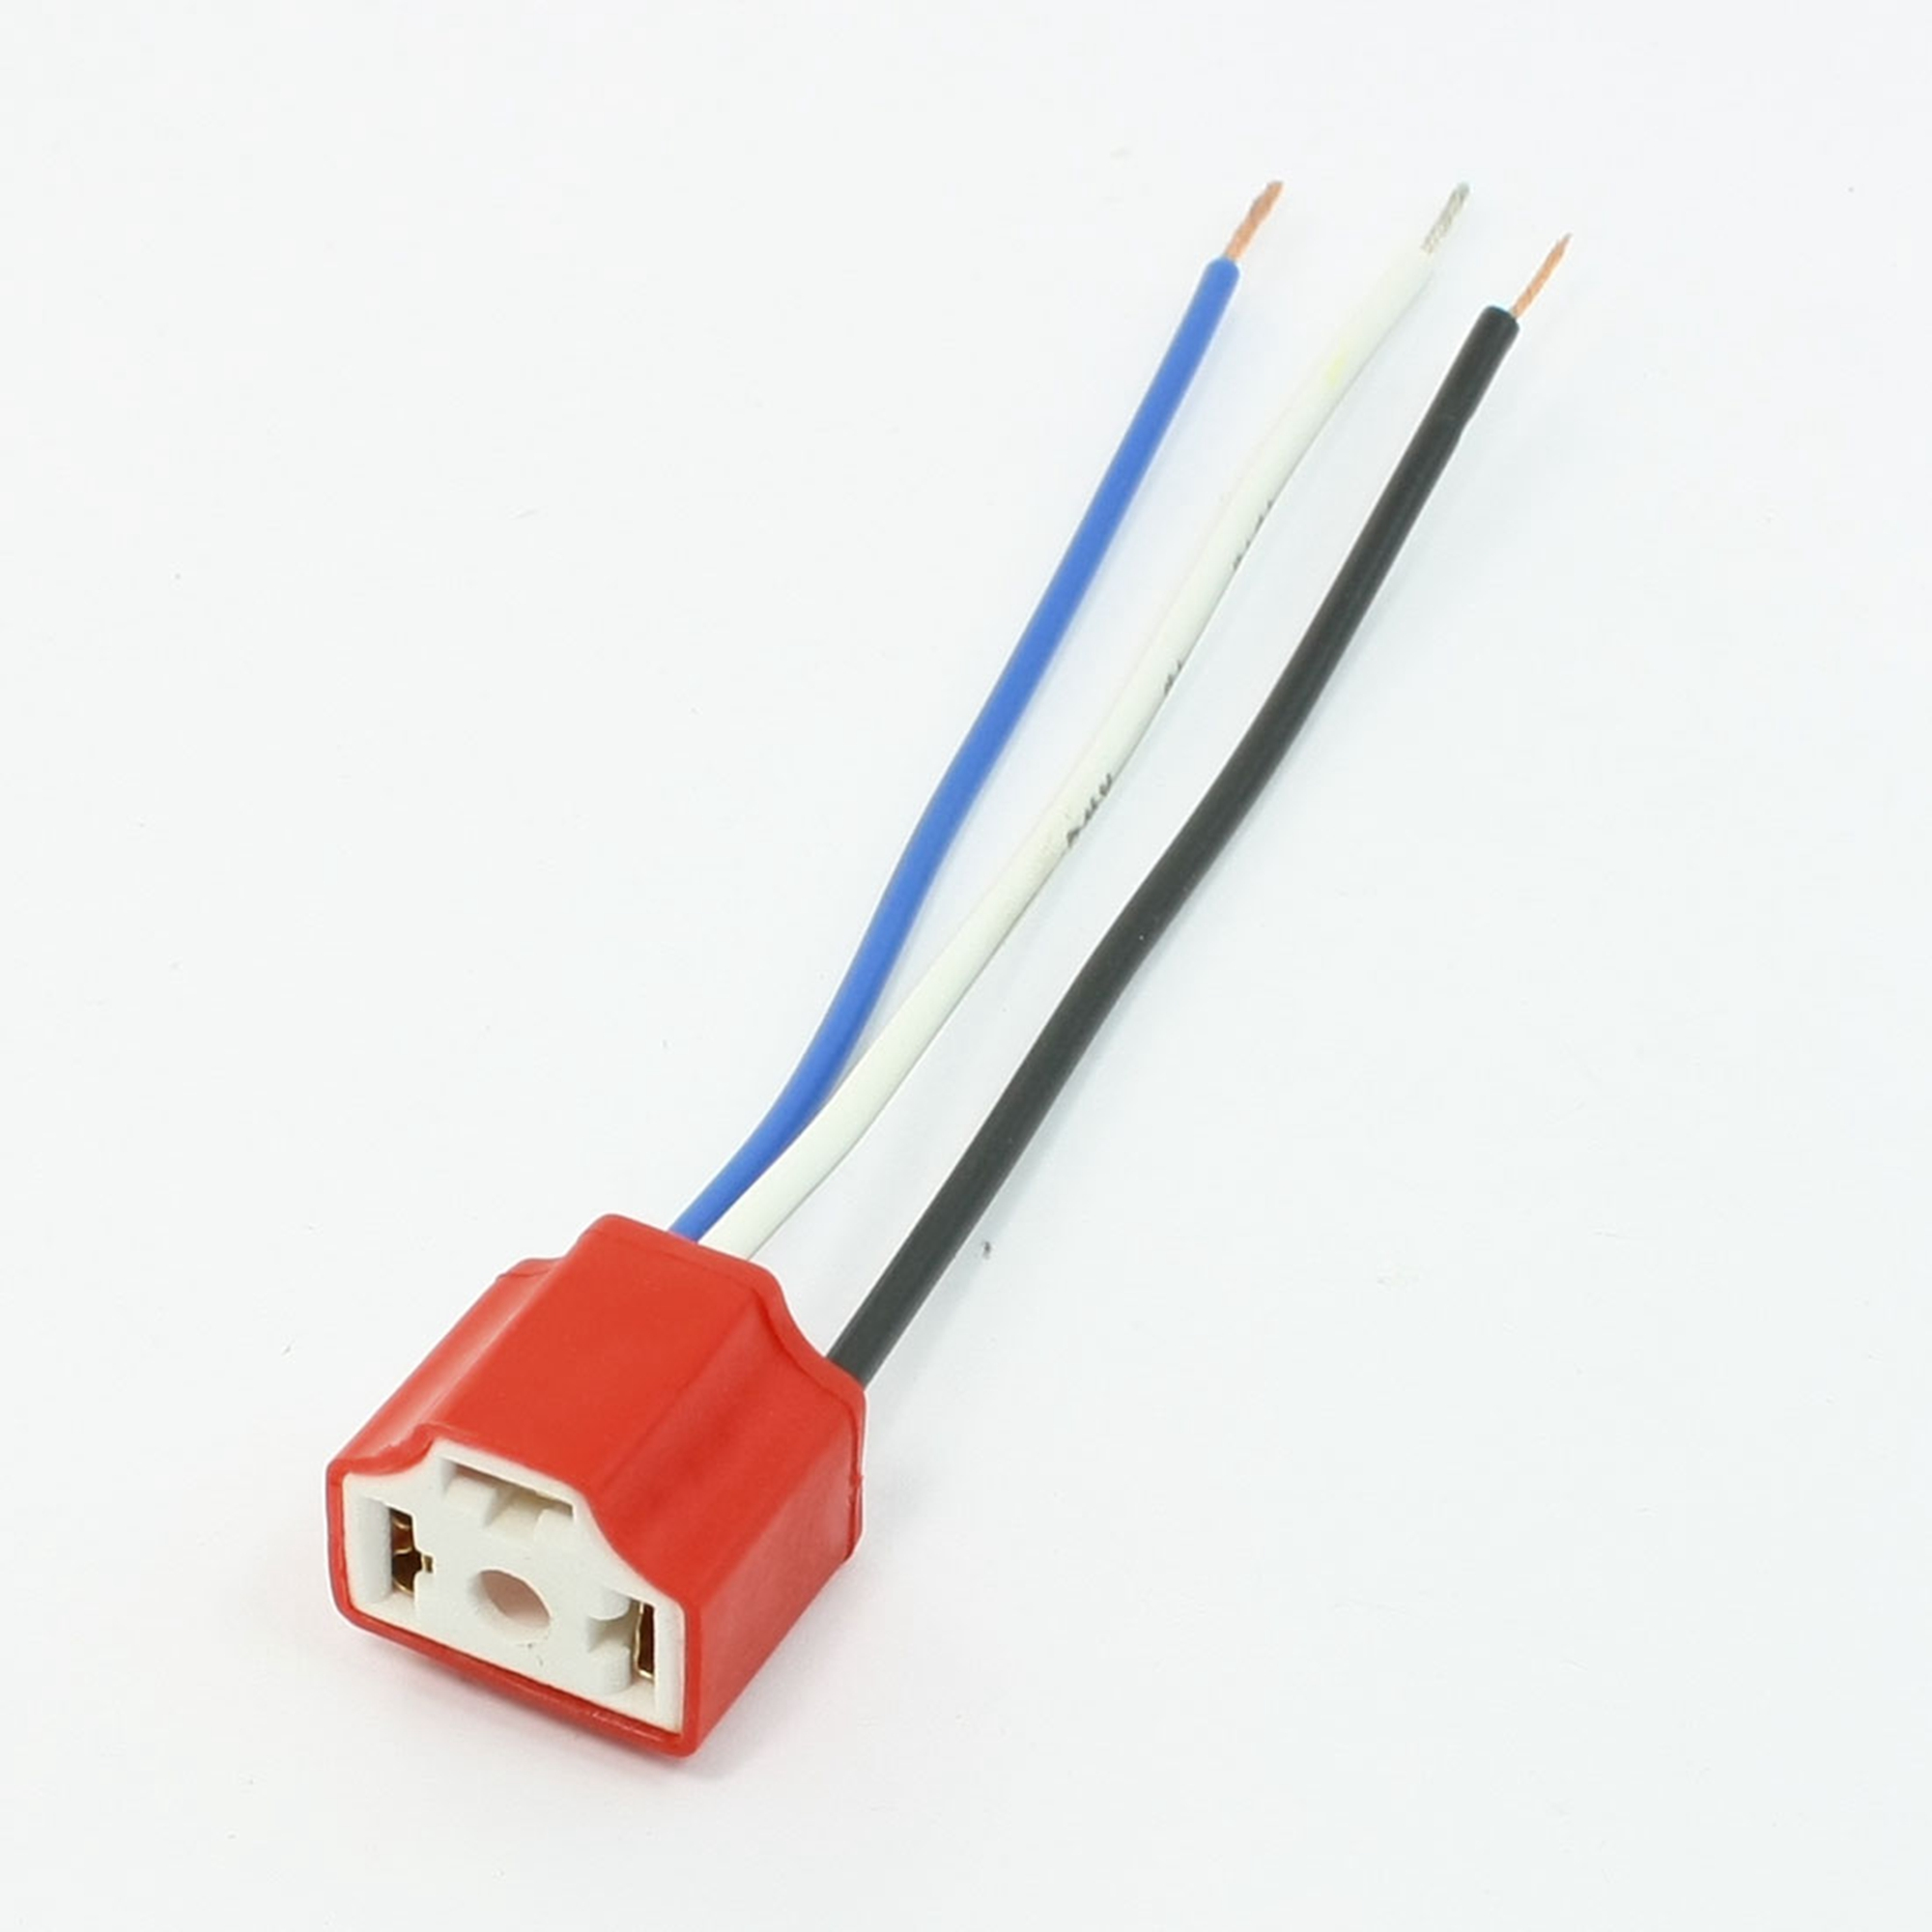 5PCS Car Auto Headlight Light Holder Red 3 Pin Female H4 Ceramic Socket